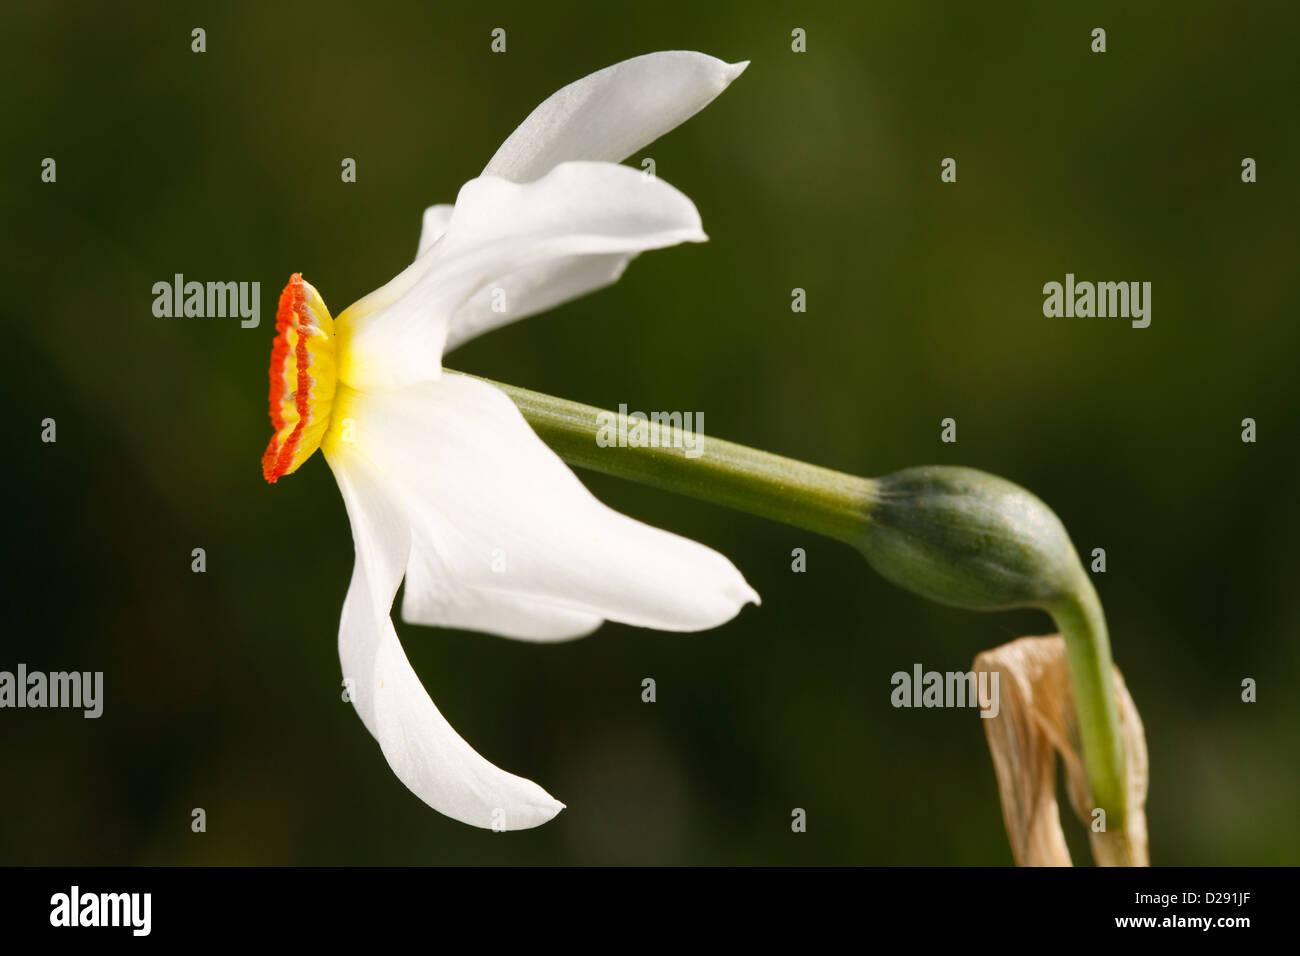 Poet's or Pheasants Eye Narcissus (Narcissus poeticus) flower. Porté-Puymorens, Pyrénées-Orientales, - Stock Image